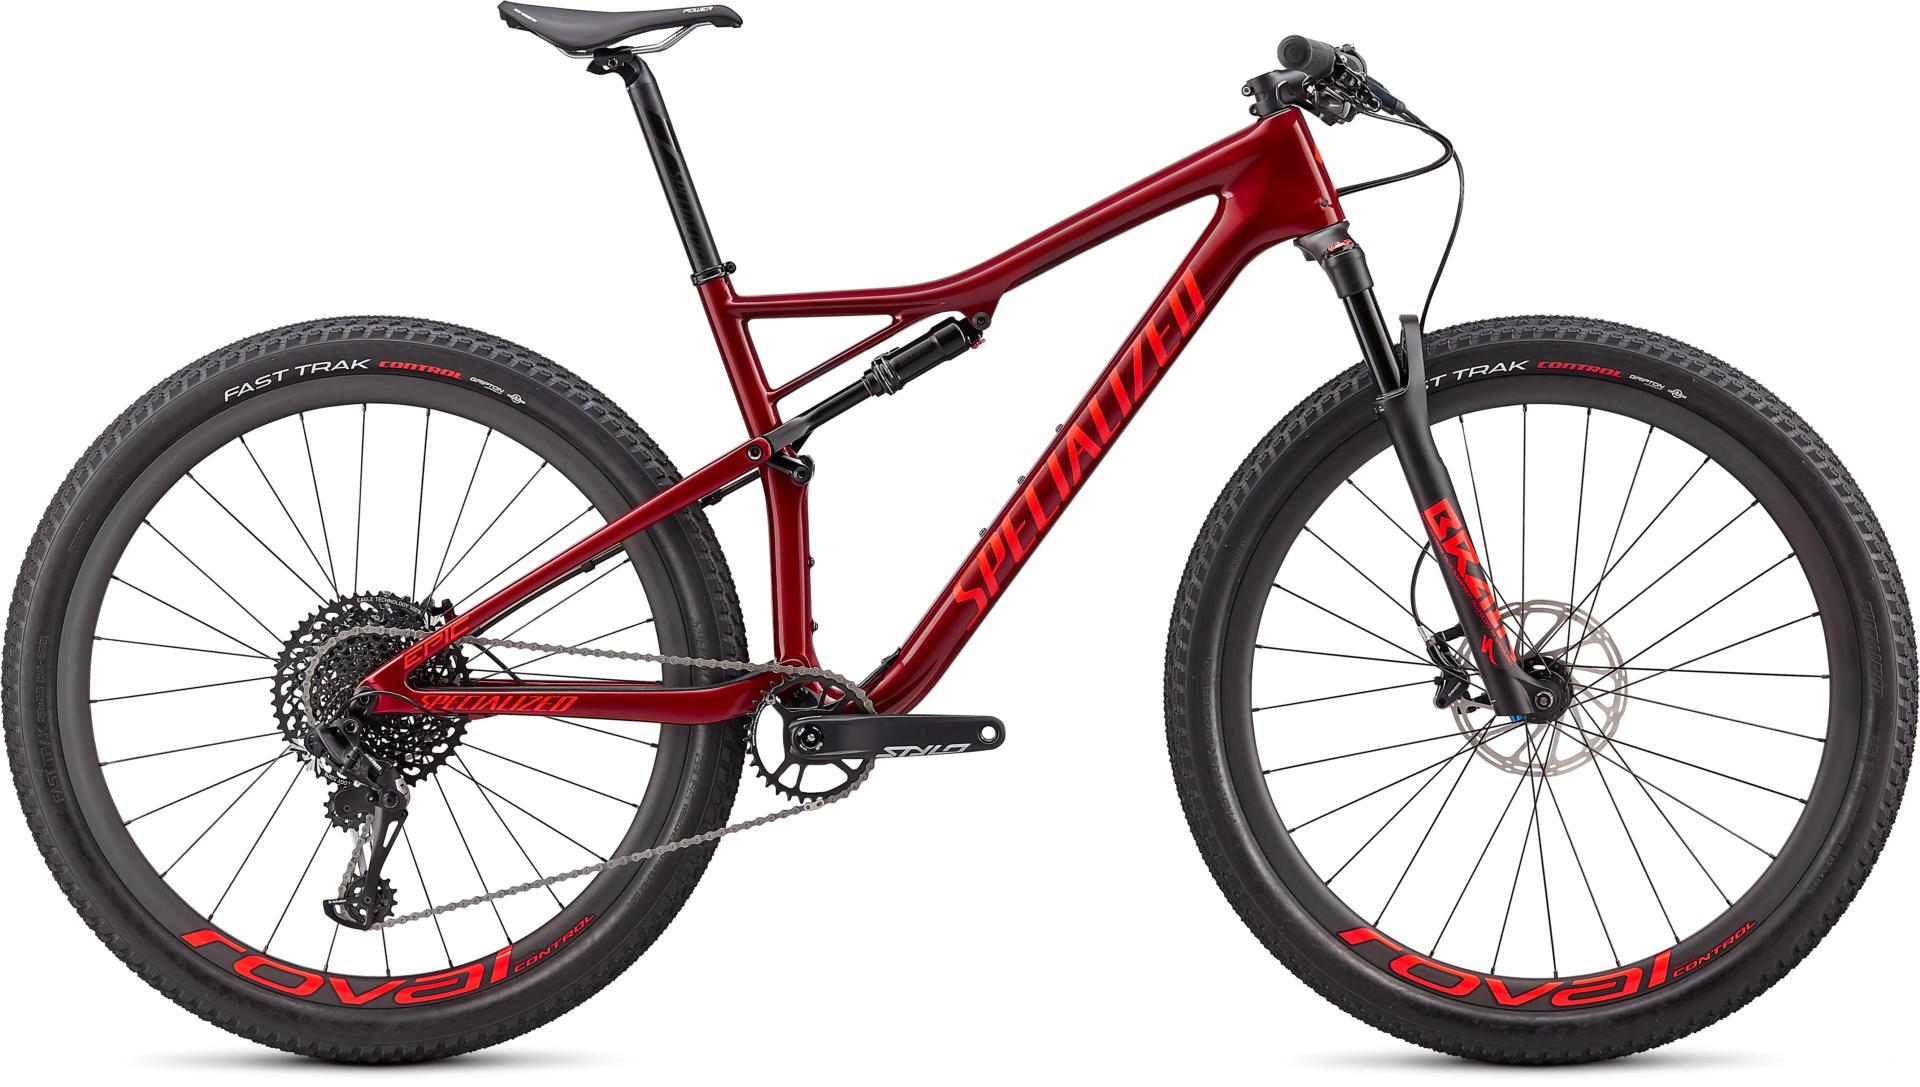 Epic-Expert-DISC-All-Bikes-Putte-Ludwig-Wynants-racefietsen-elektrische-fietsen-mountainbikes-koersfiets-kopen-herstellingen